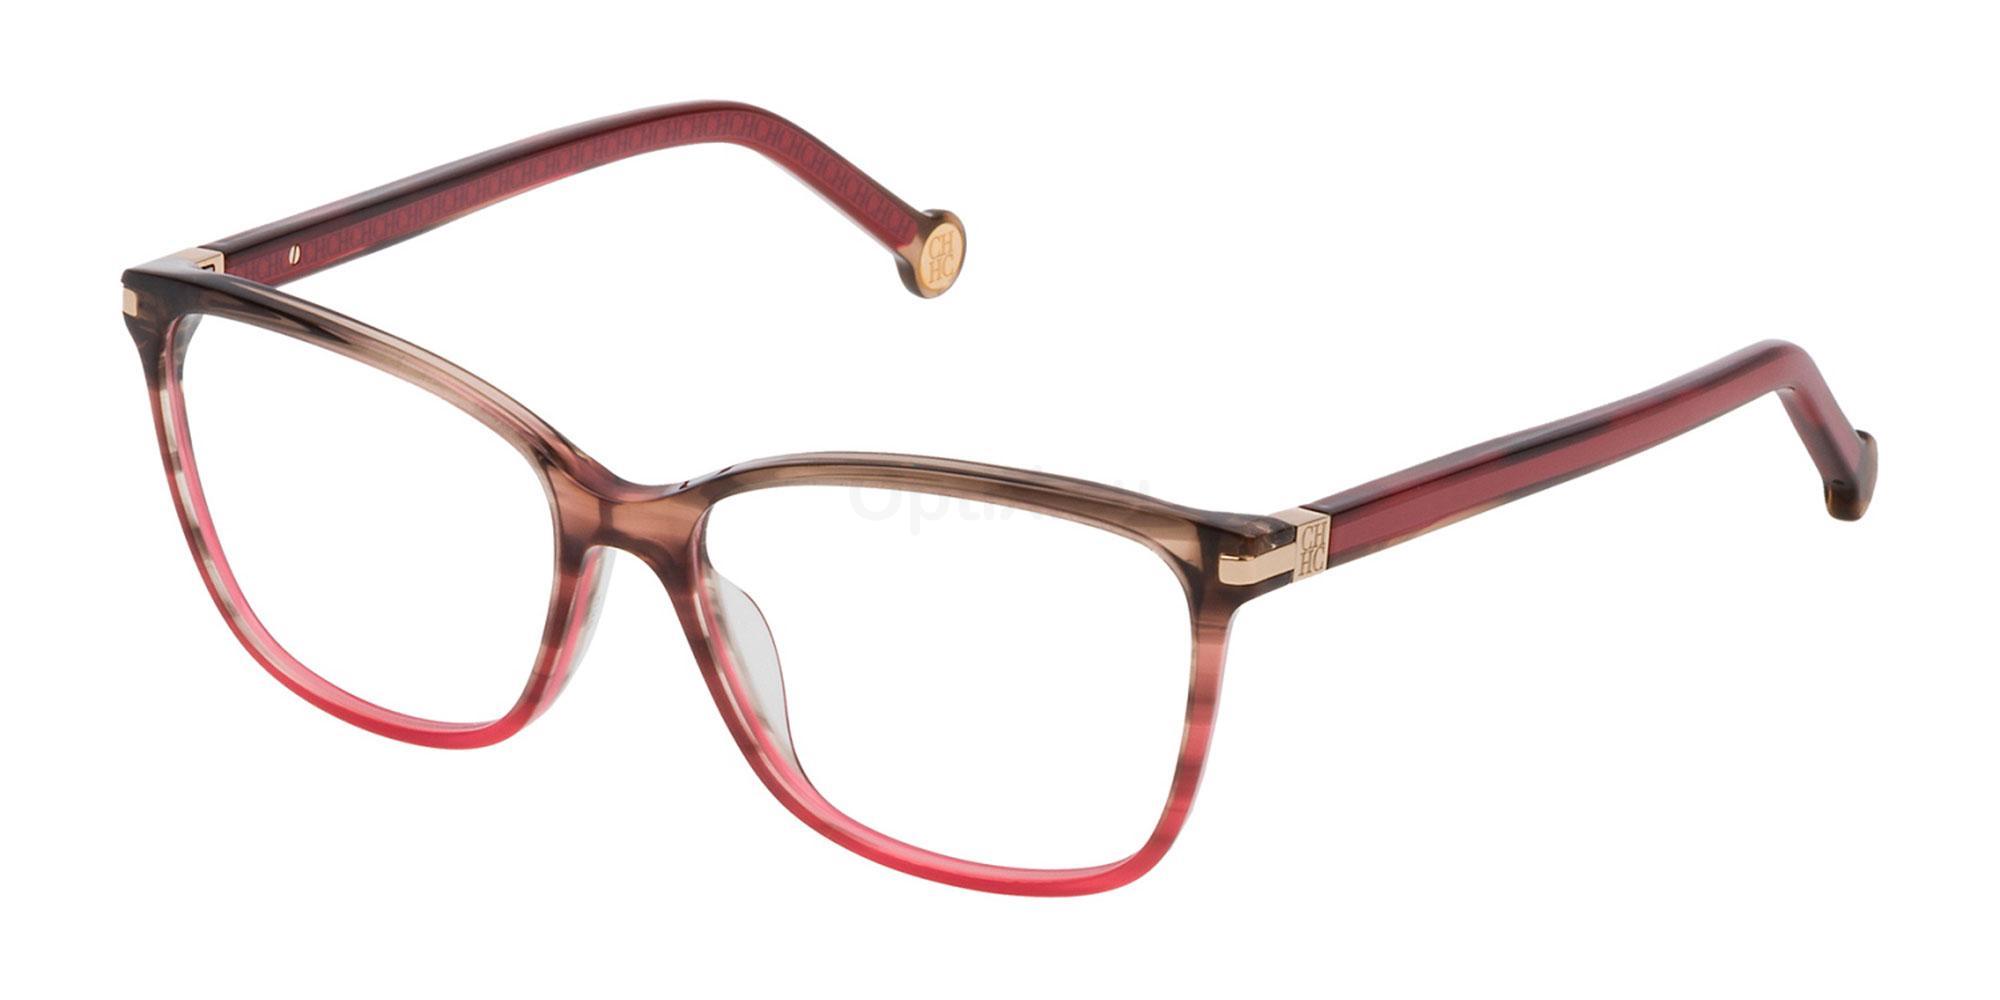 04AB VHE775 Glasses, CH Carolina Herrera